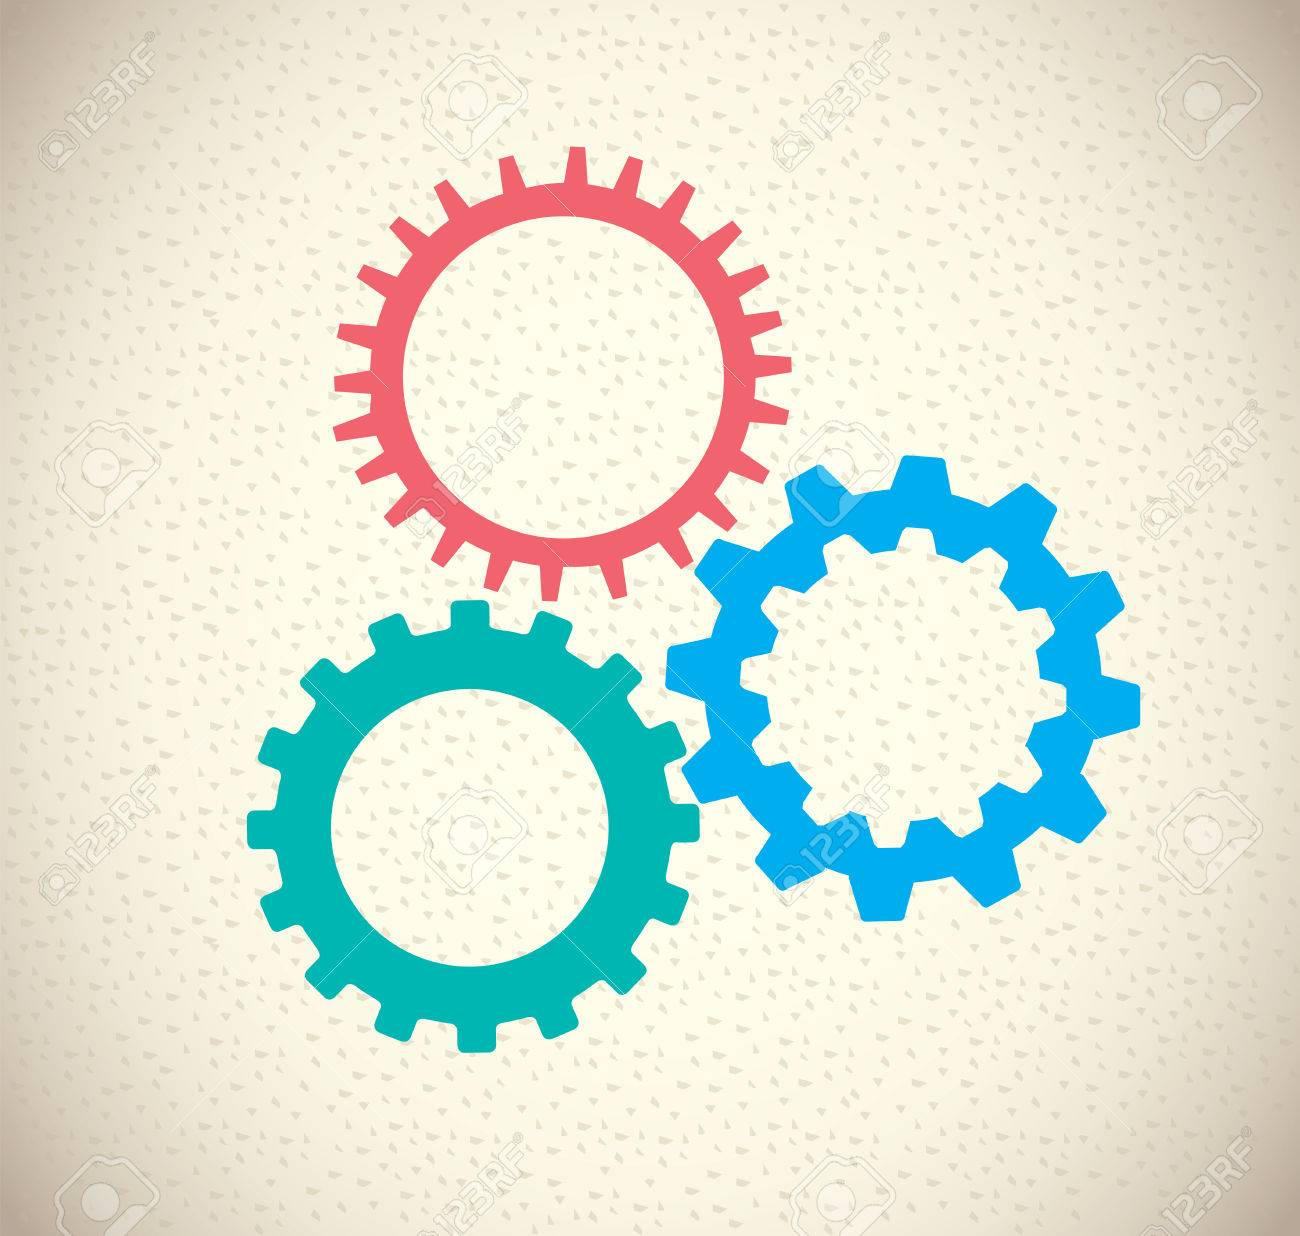 Human Resources Vector Vector Human Resources Over